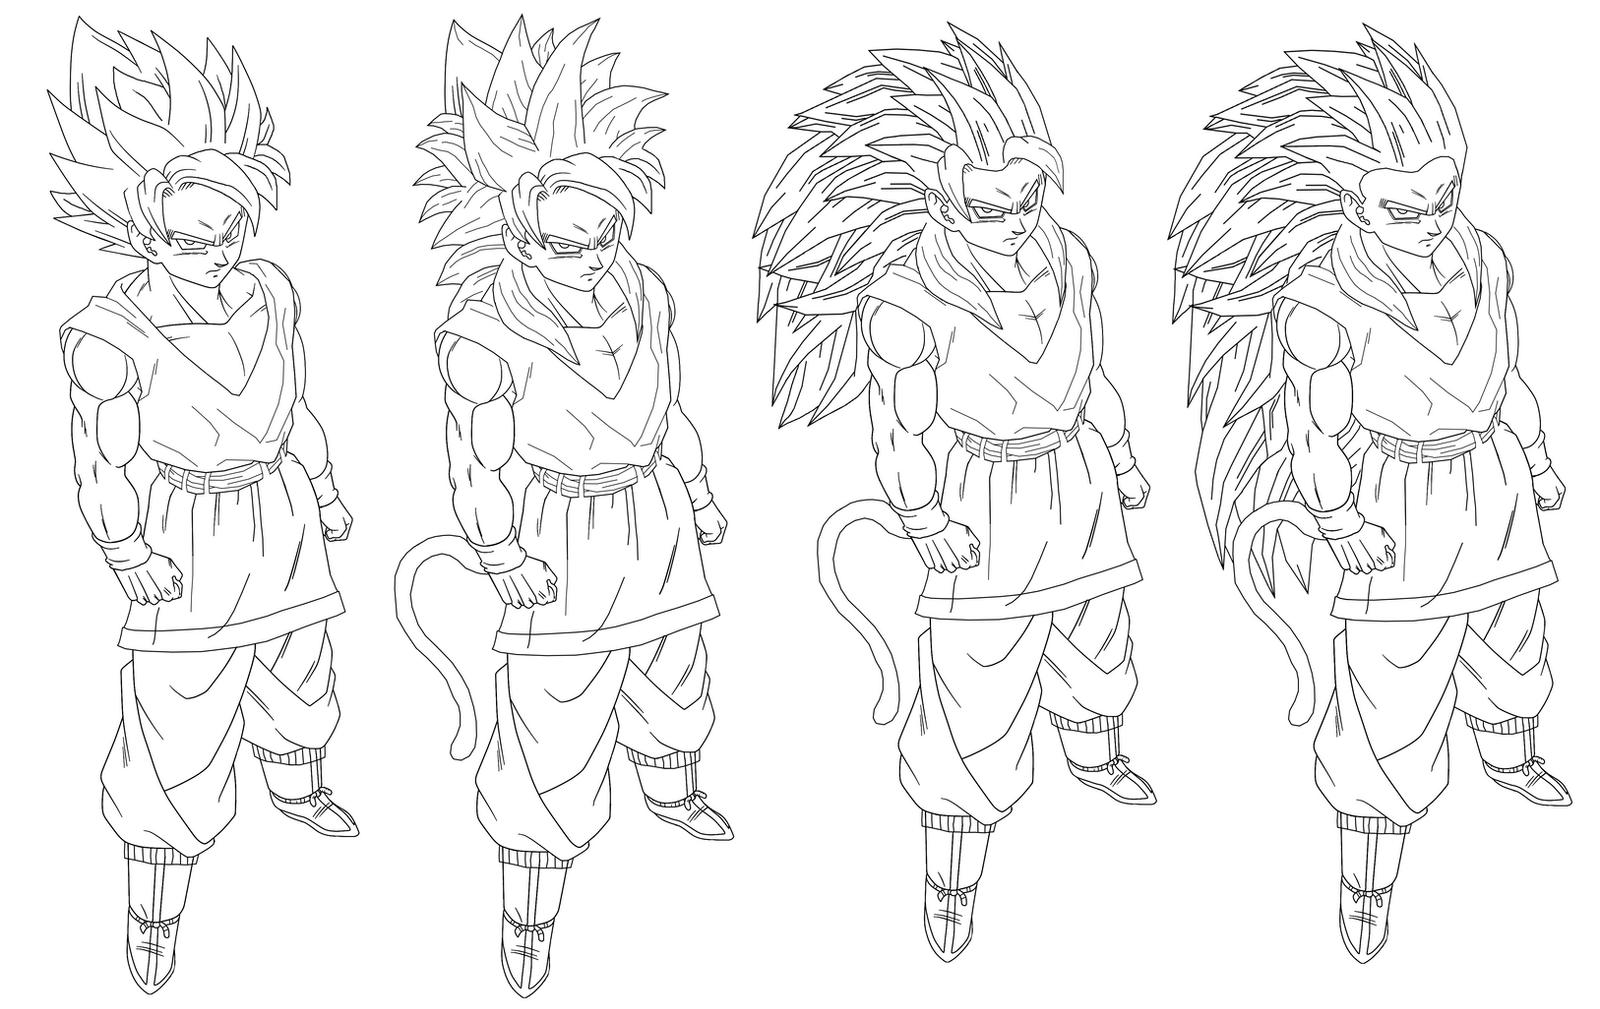 Majin Vegeta Vs Ssj2 Goku Lineart By Brusselthesaiyan On: Lineart-all Goku Ssj Part 2 By Naruttebayo67 On DeviantArt